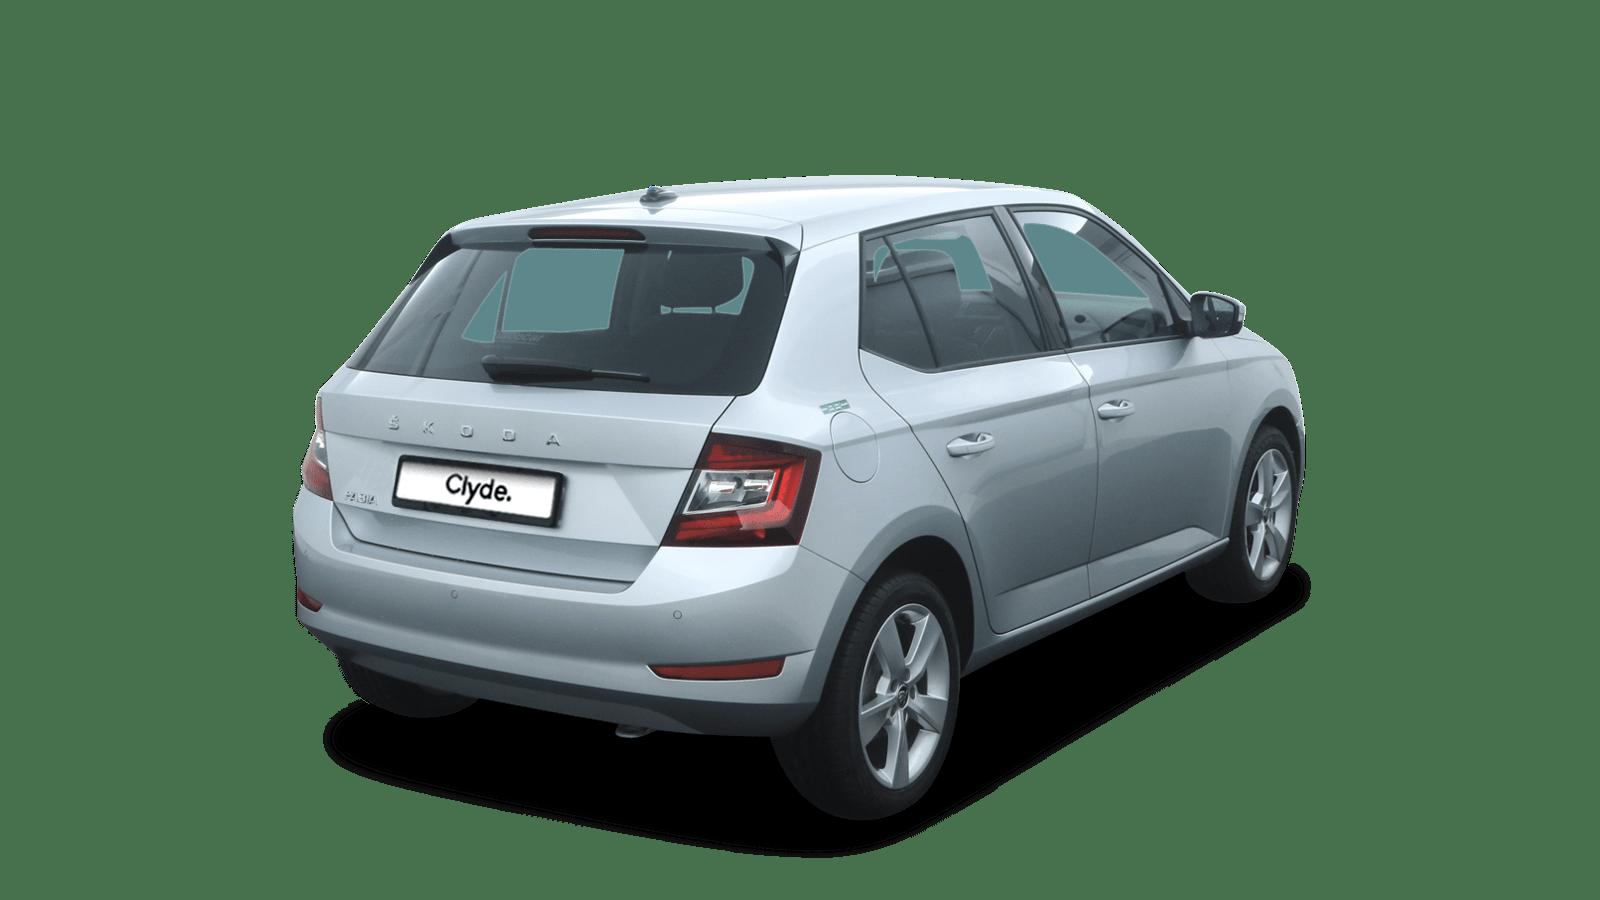 ŠKODA Fabia Silver back - Clyde car subscription